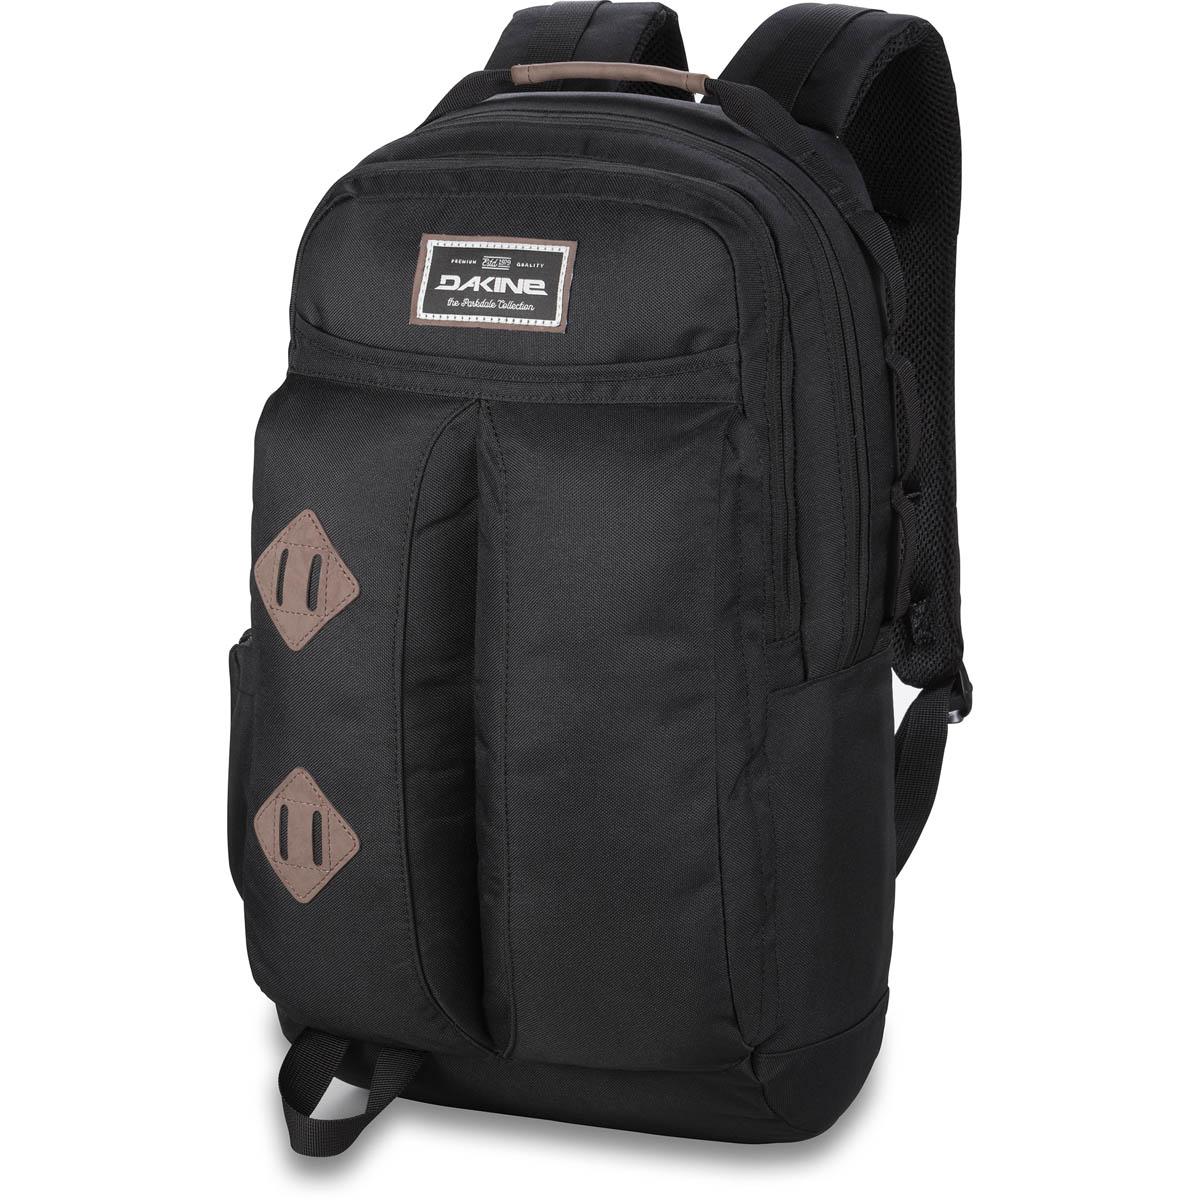 bb9a16b9c5 Dakine Scramble 24L iPad/Laptop Rucksack Black | Dakine Shop